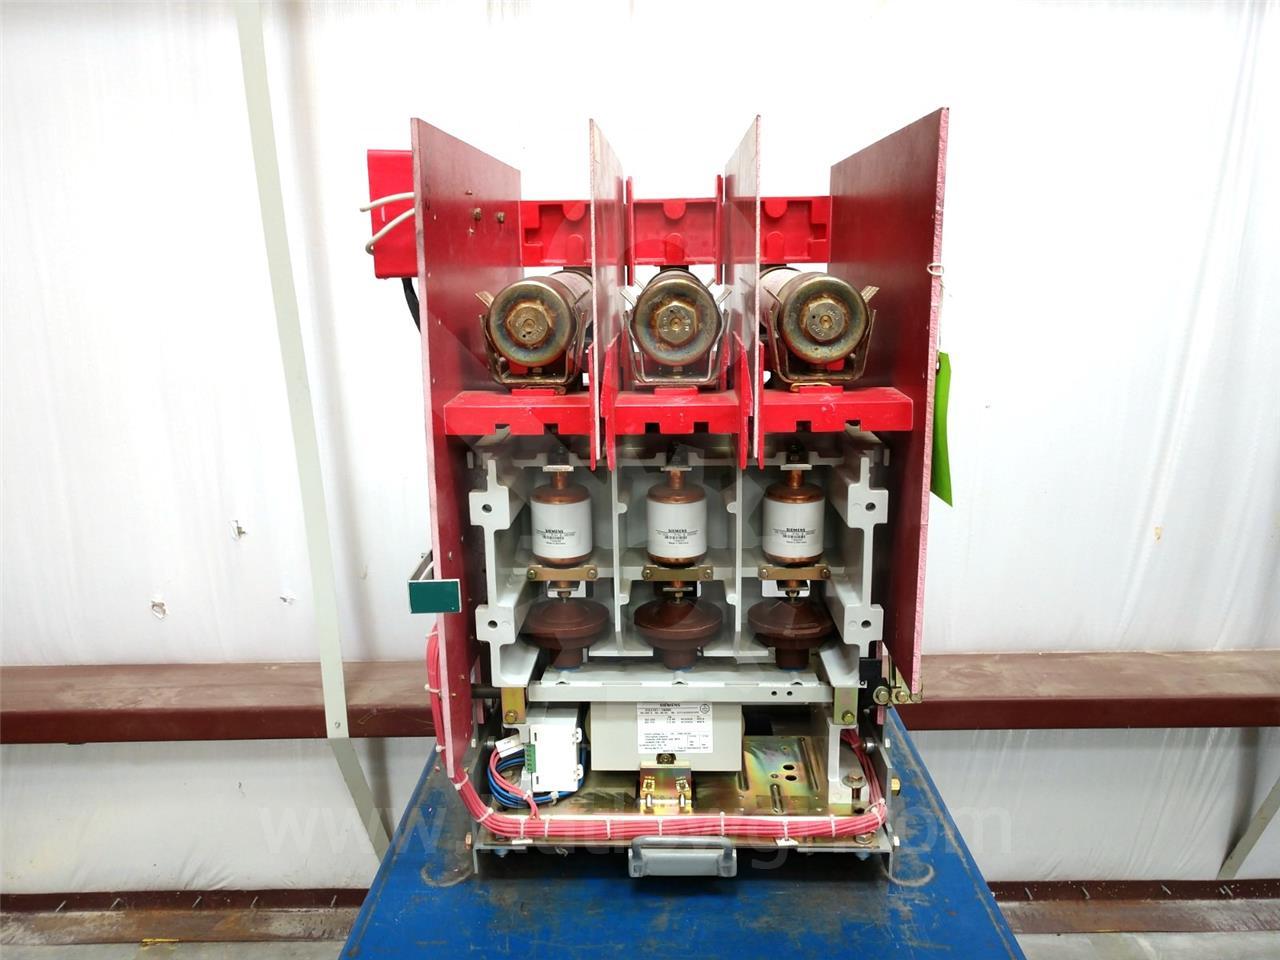 Siemens / Allis Chalmers 360A SA 97H35 AC VACUUM CONTACTOR 5KV UNUSED SURPLUS